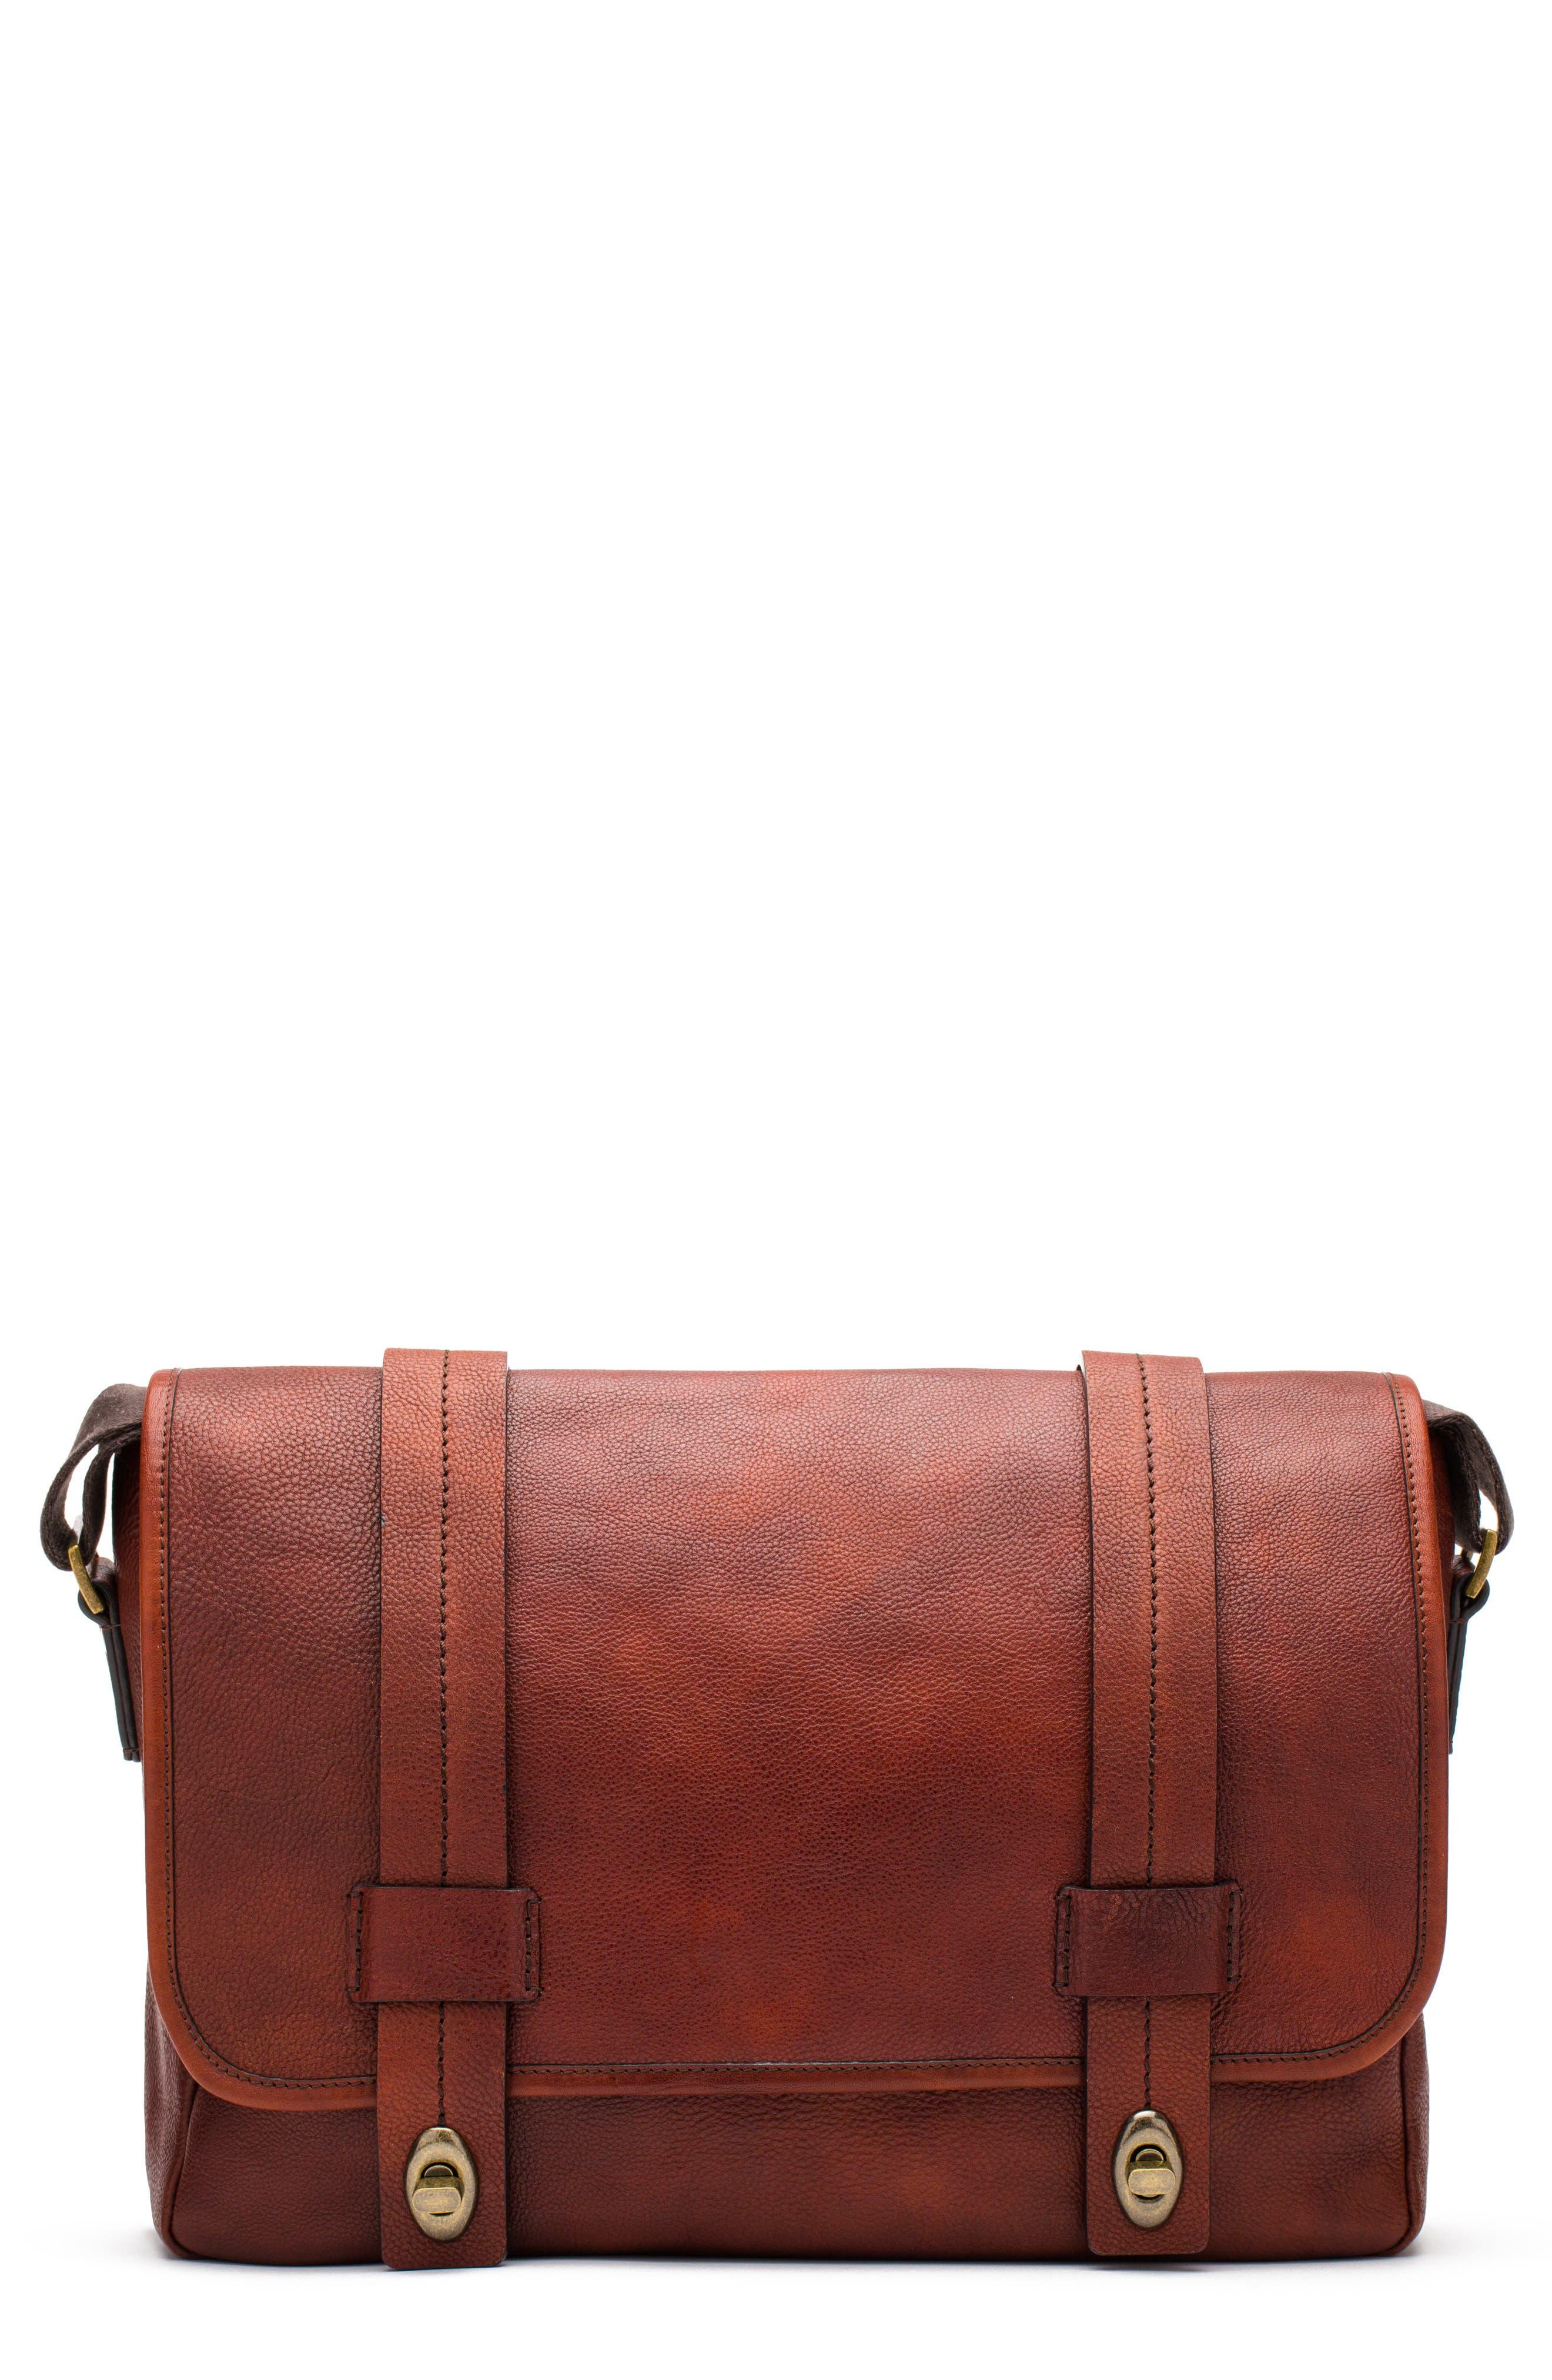 Main Image - Bosca Leather Messenger Bag